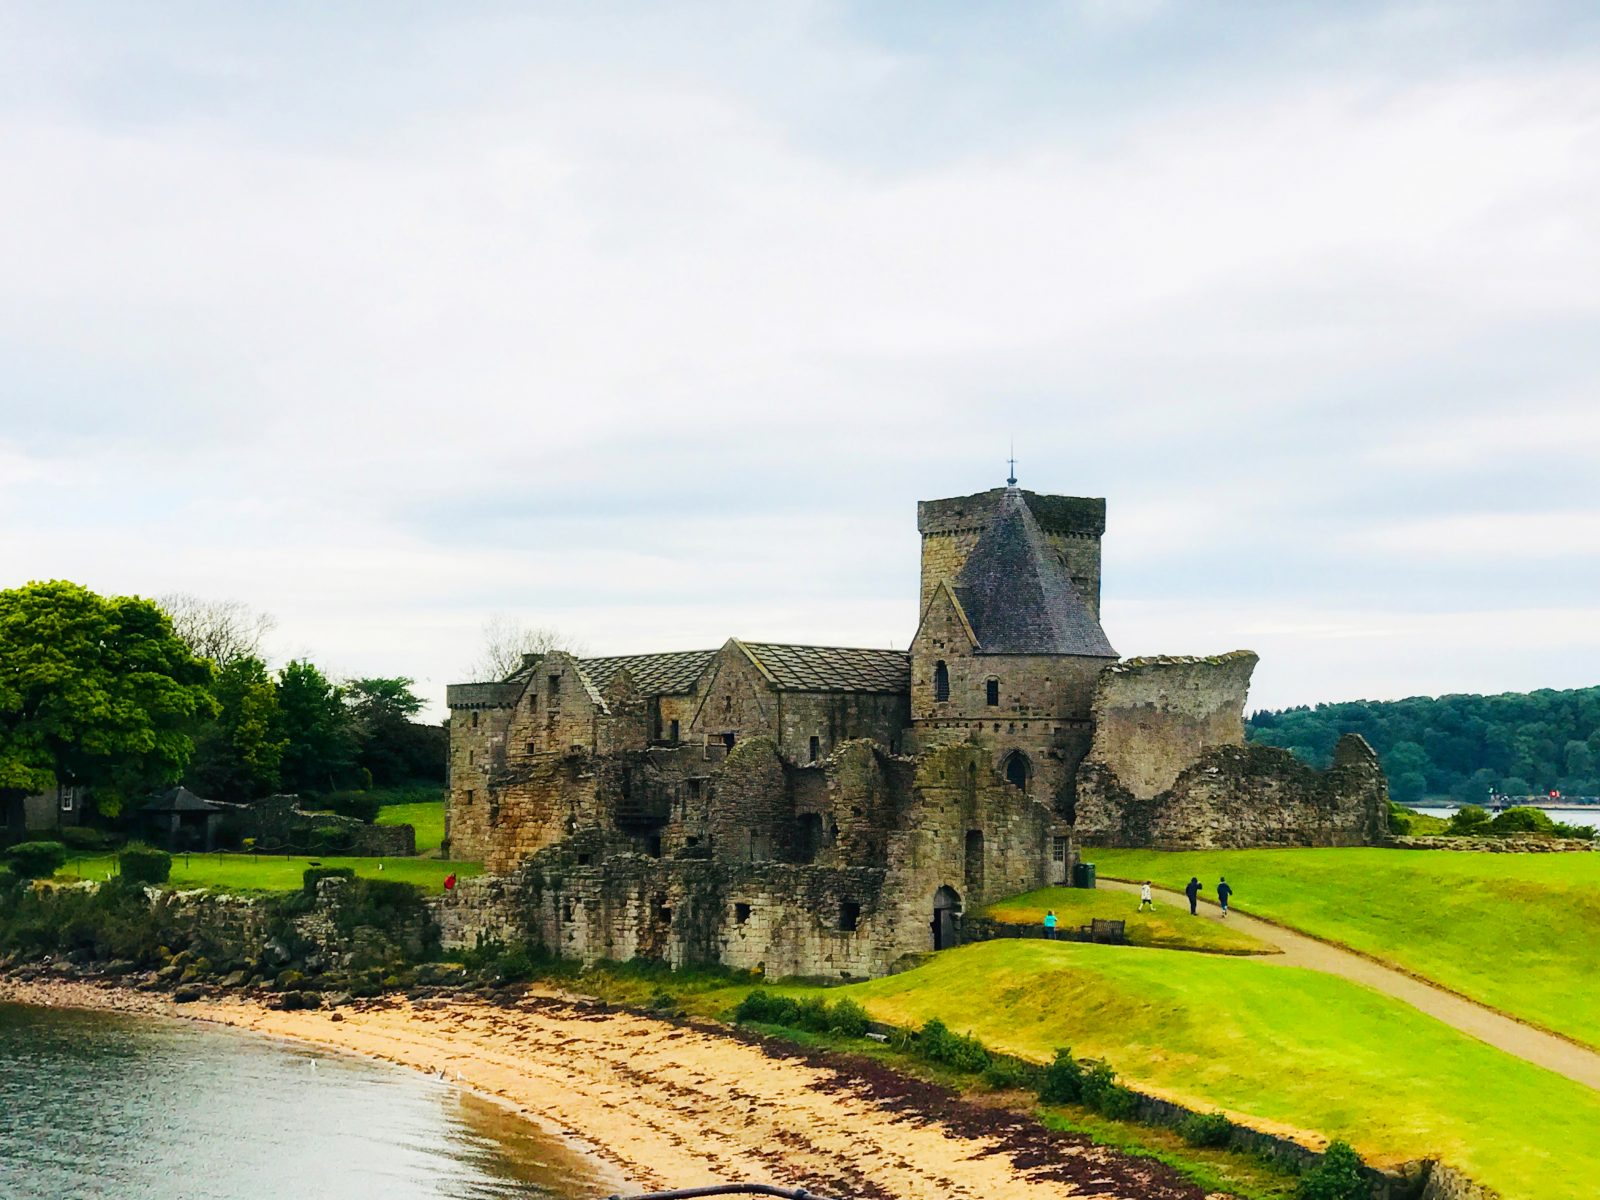 Inchcolm Island and Inchcolm Abbey